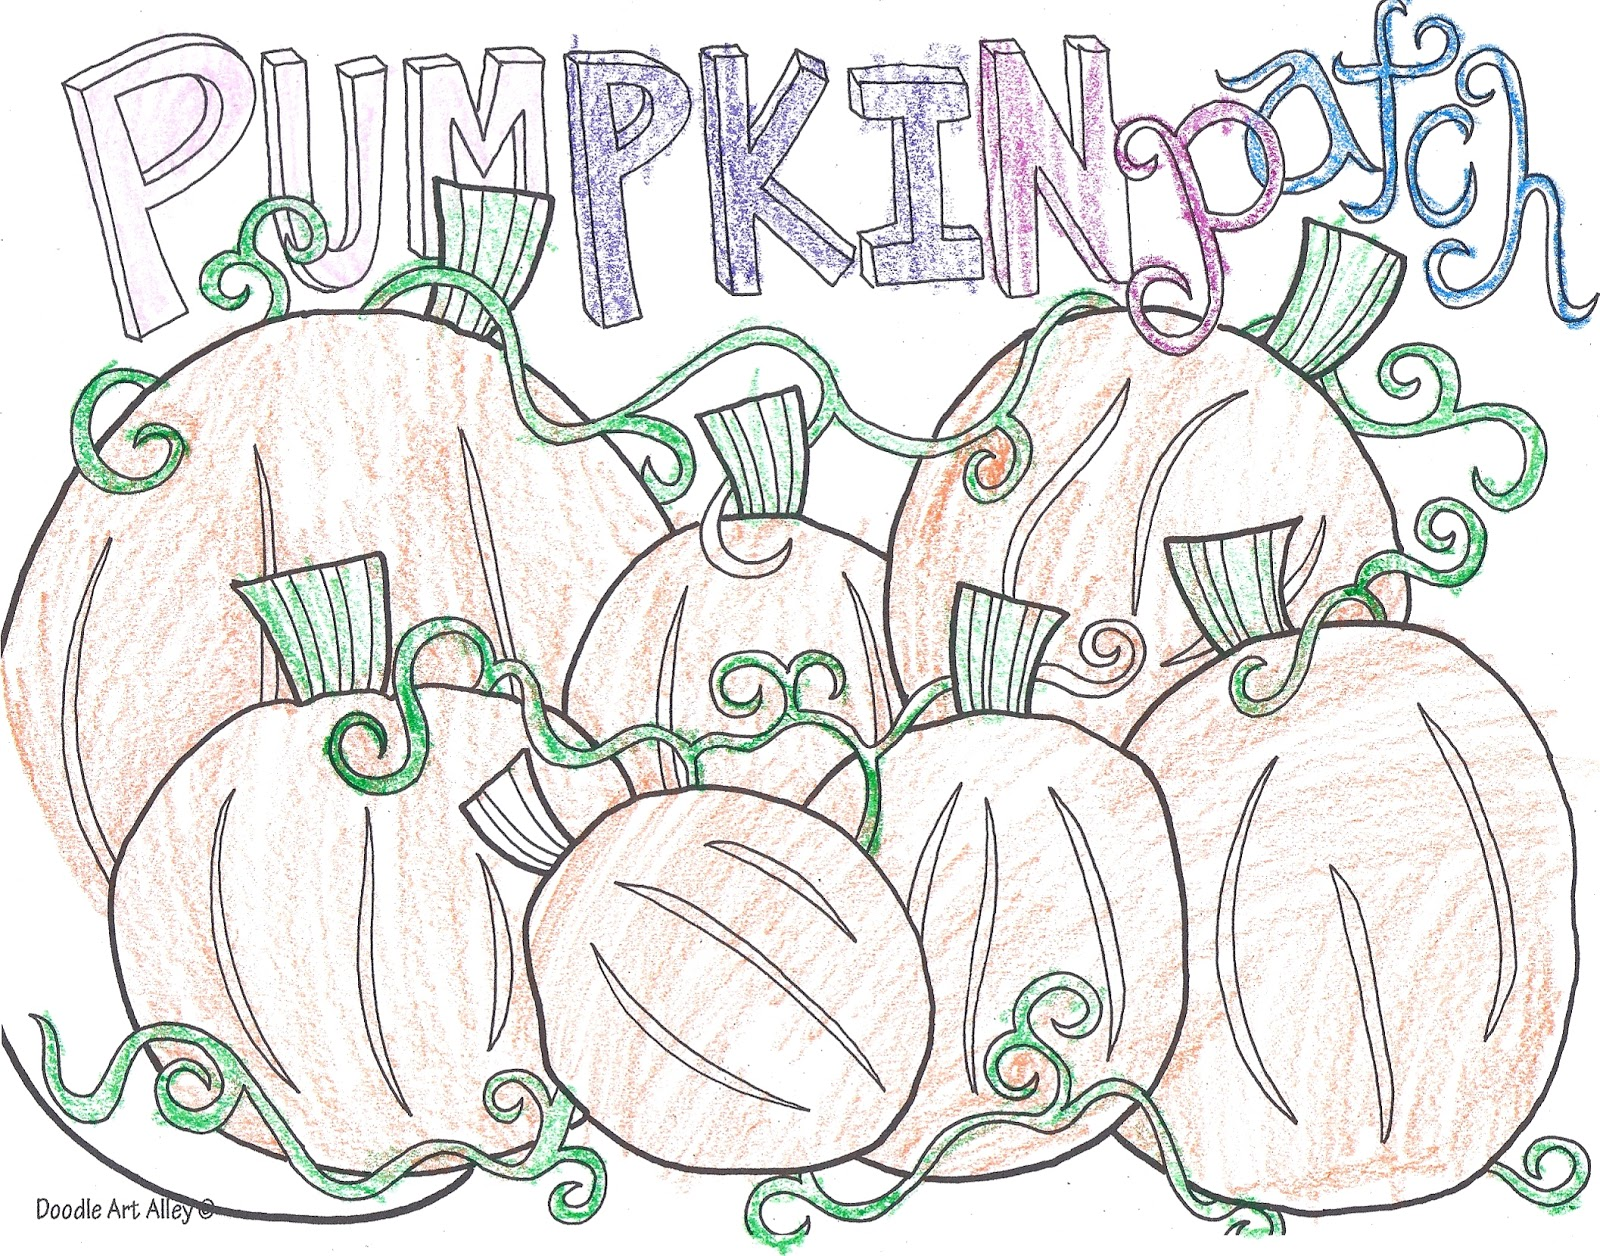 Doodle S: Happy Clean Living: Halloween Doodle Art With The Jolley's